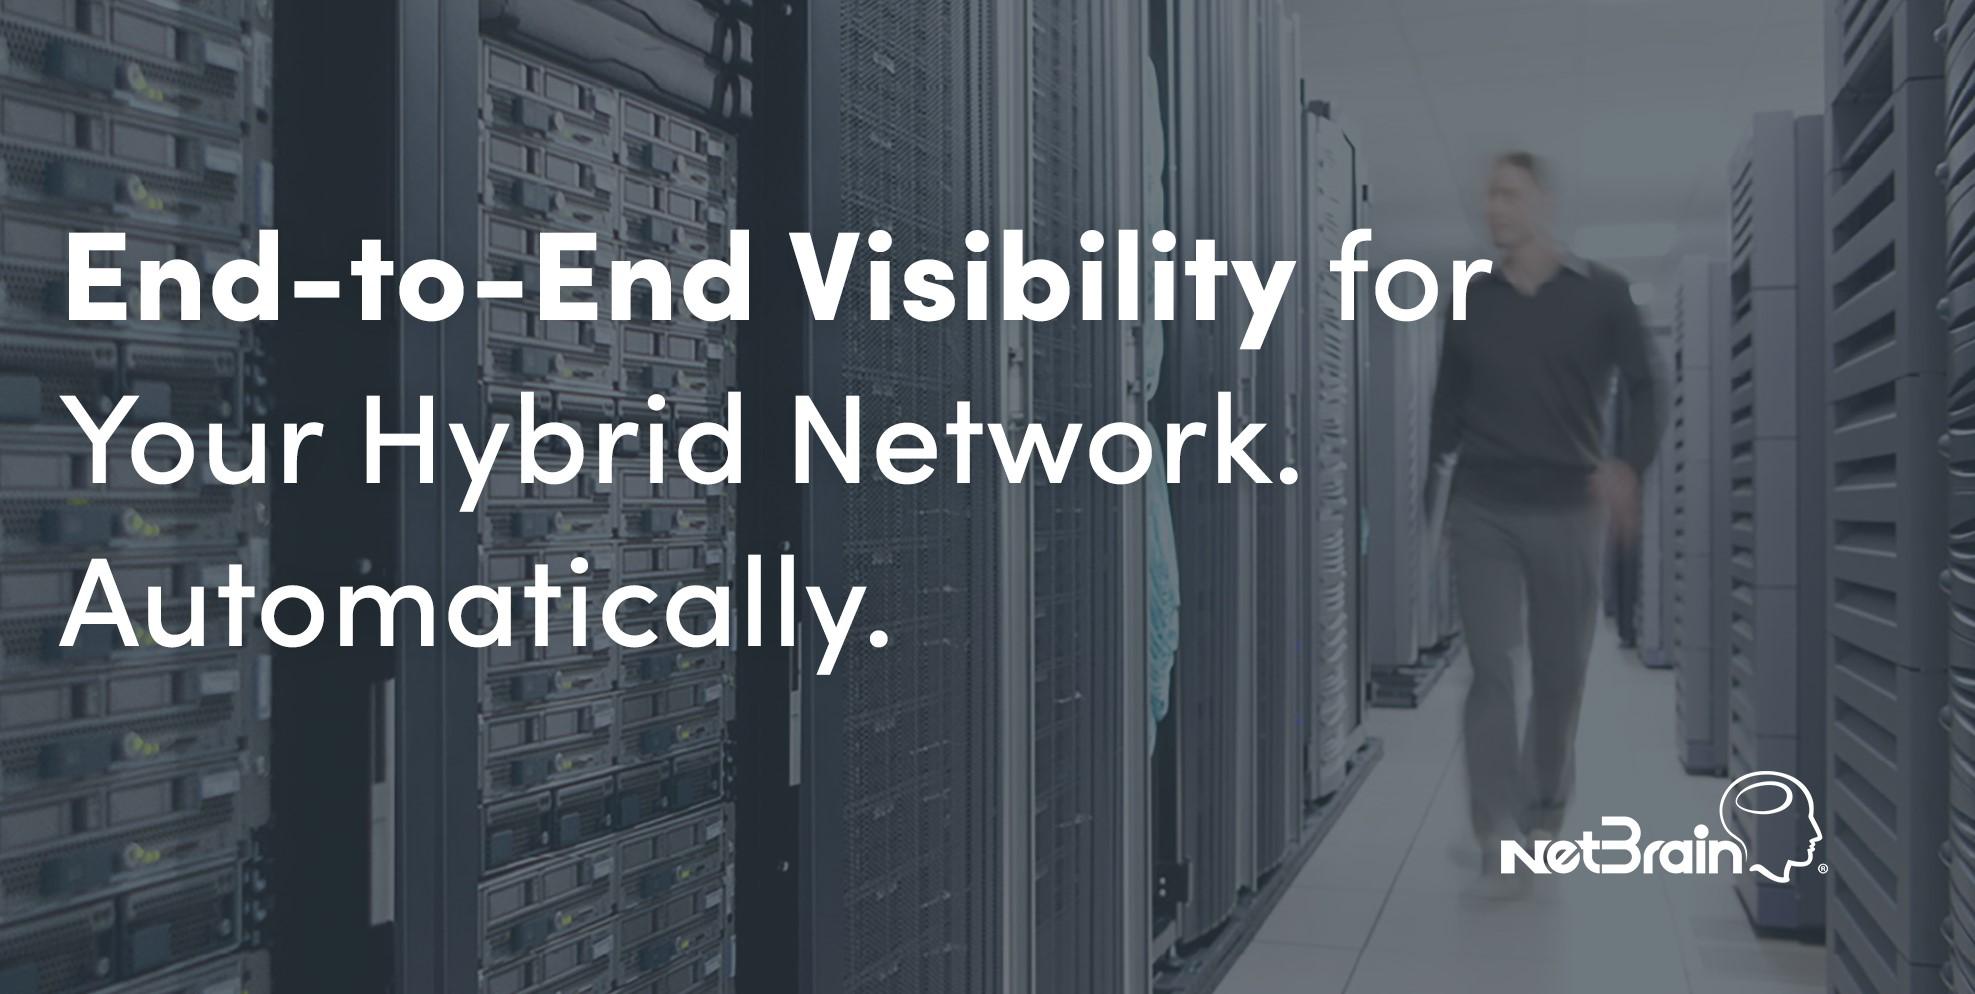 NetBrain Hybrid Network Visability